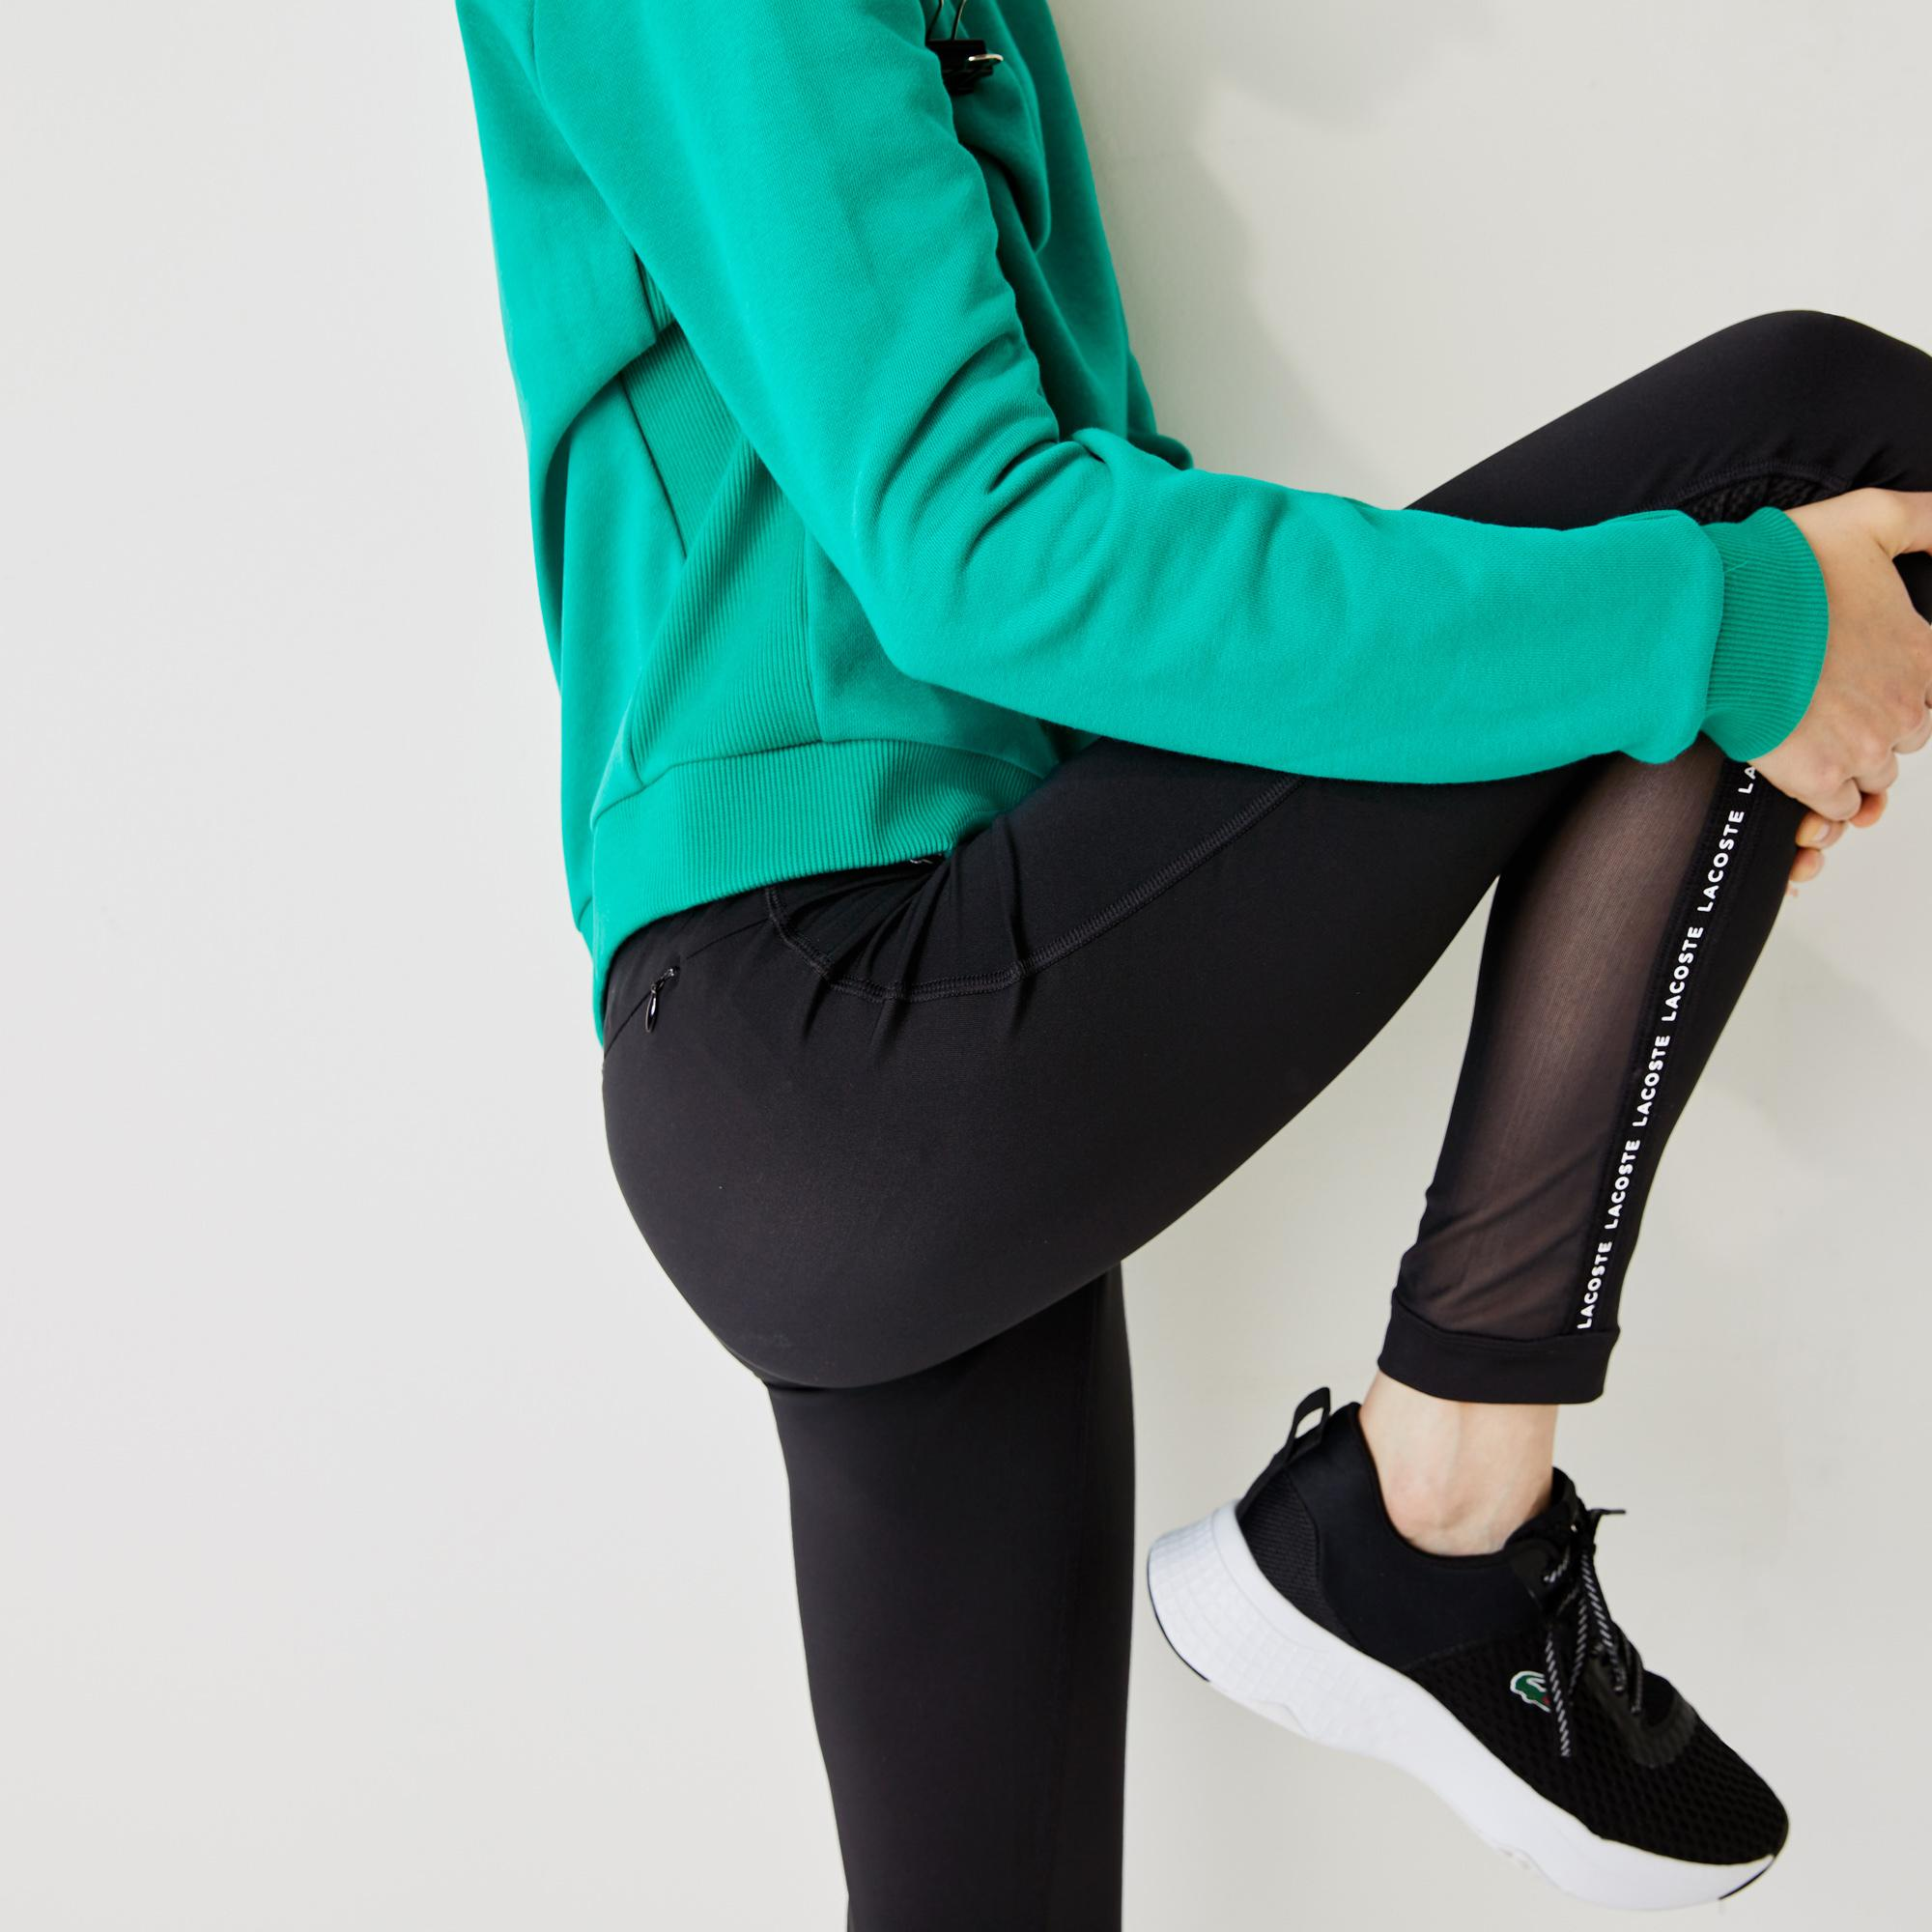 Lacoste Women's Sport Paneled Breathable Stretch Tennis Leggings